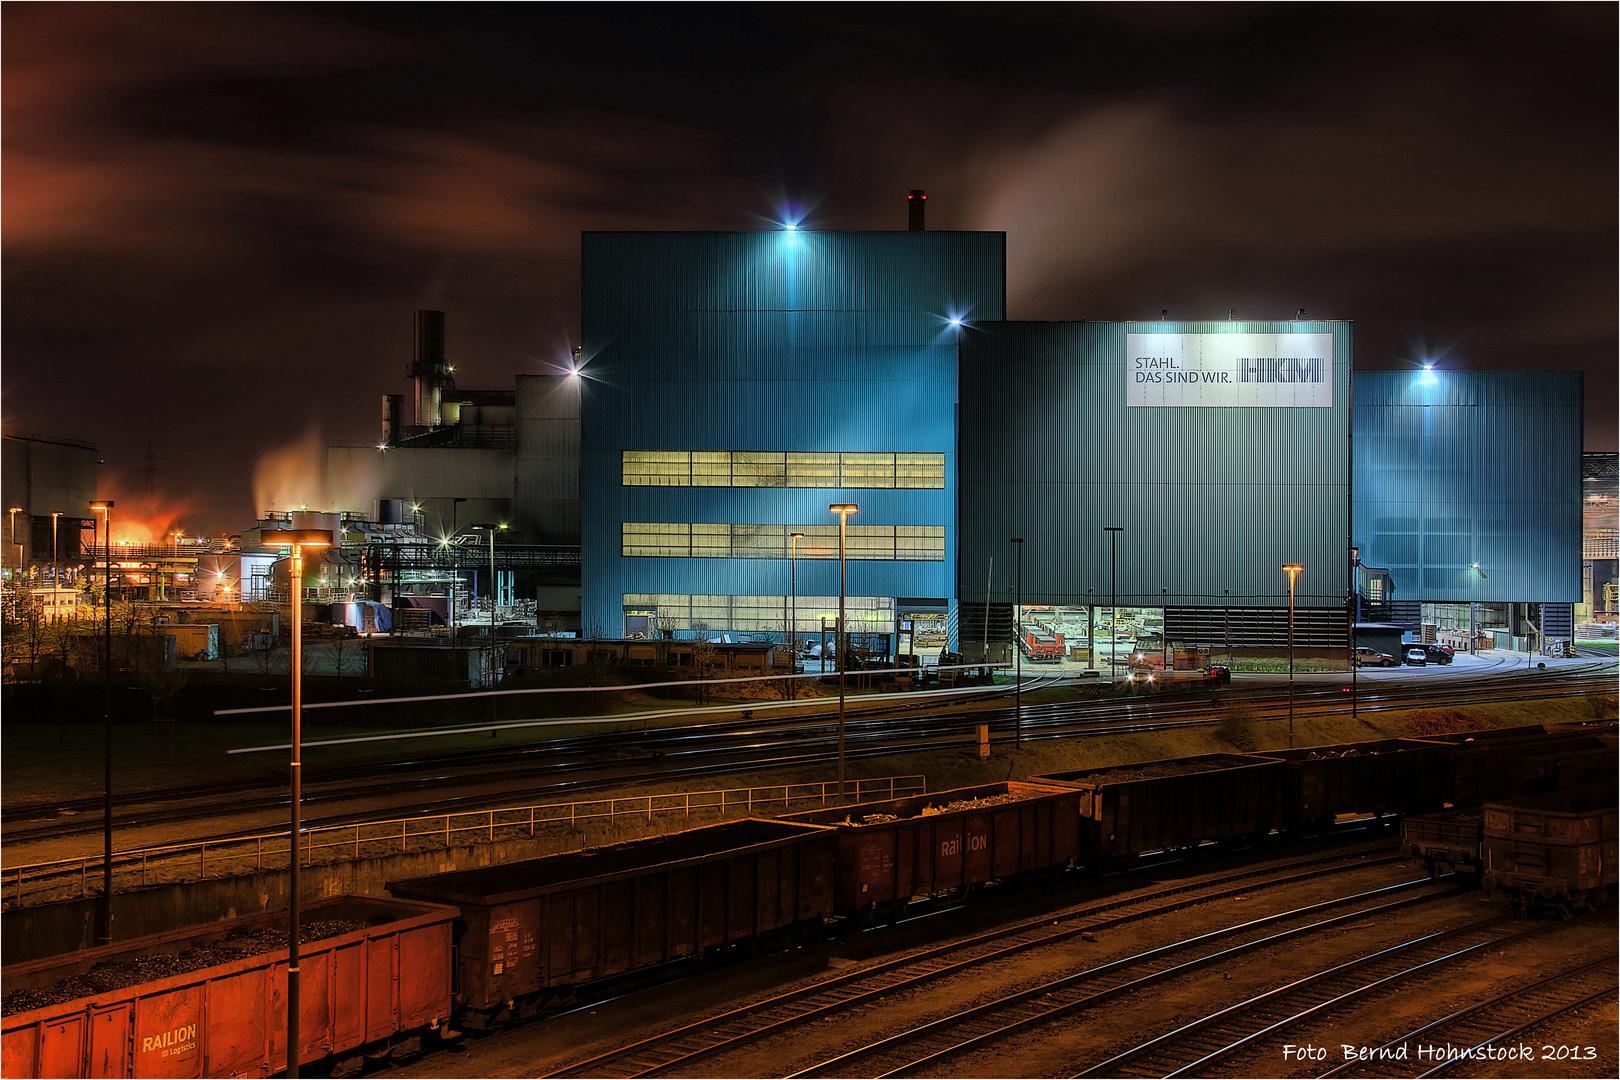 HKM Duisburg ... Abstich